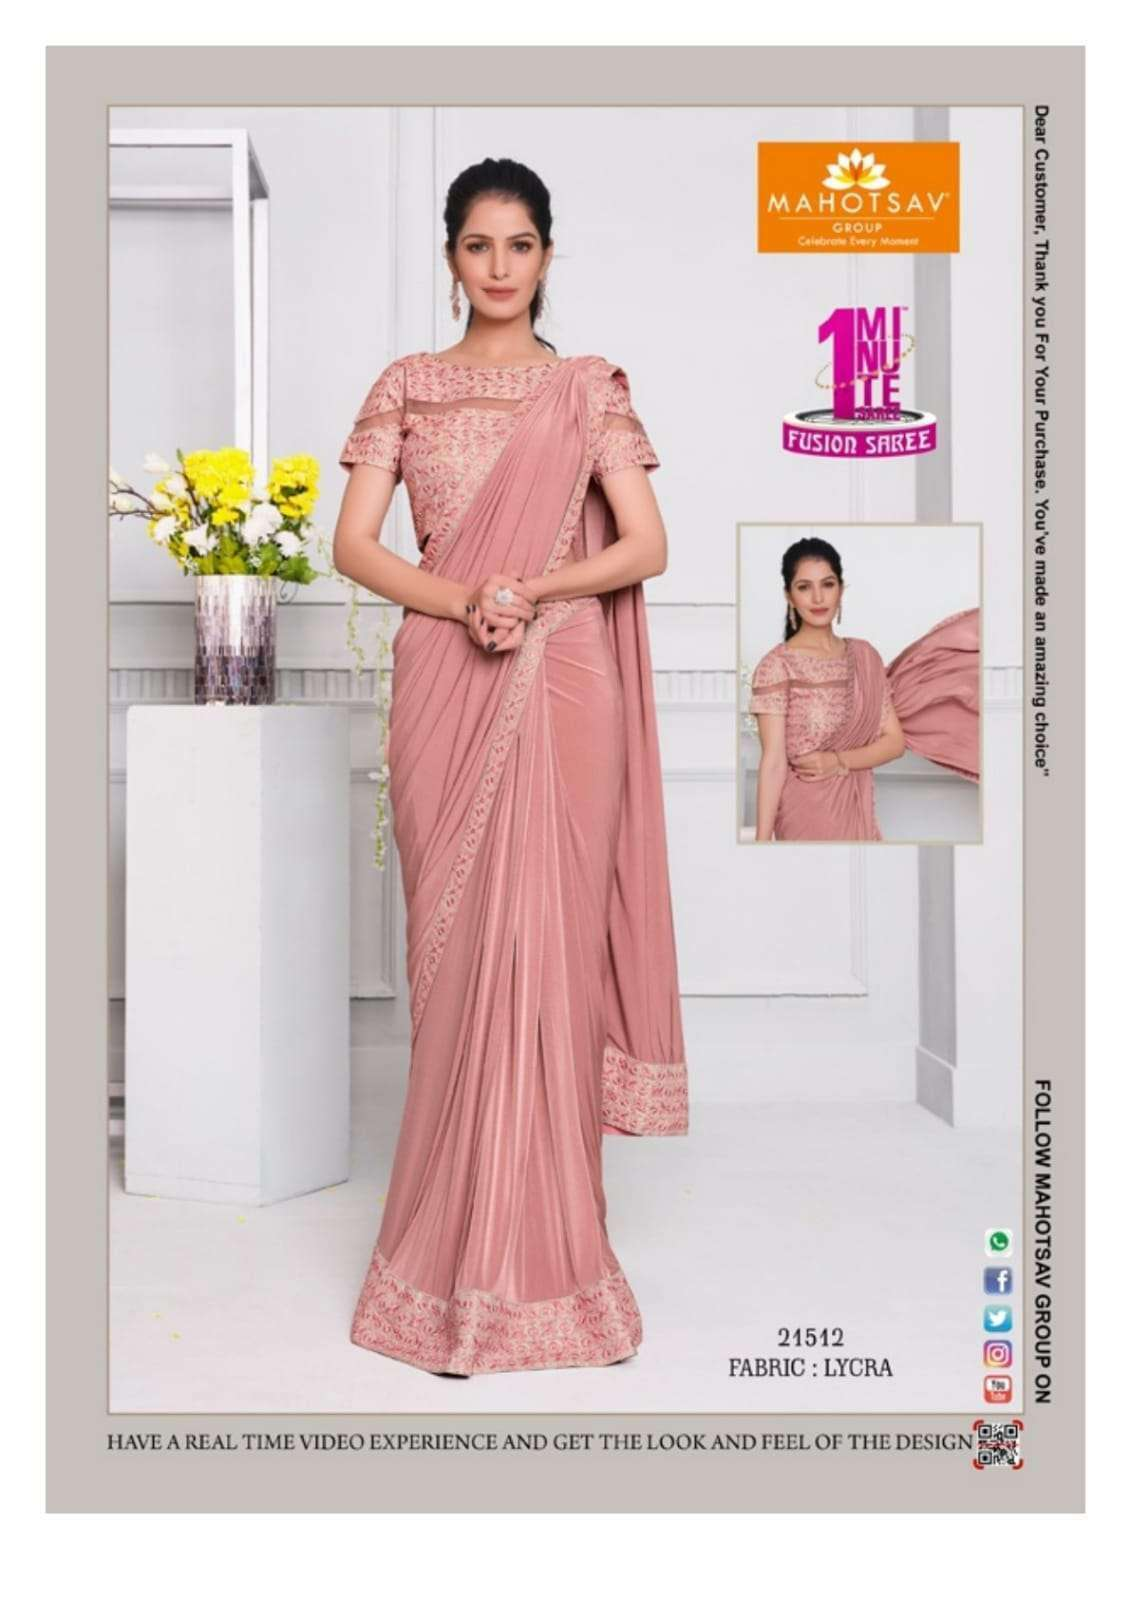 Mahotsav Moh Manthan Izzara 21501 To 215018 Series Fancy Designer Sarees Collection 21512